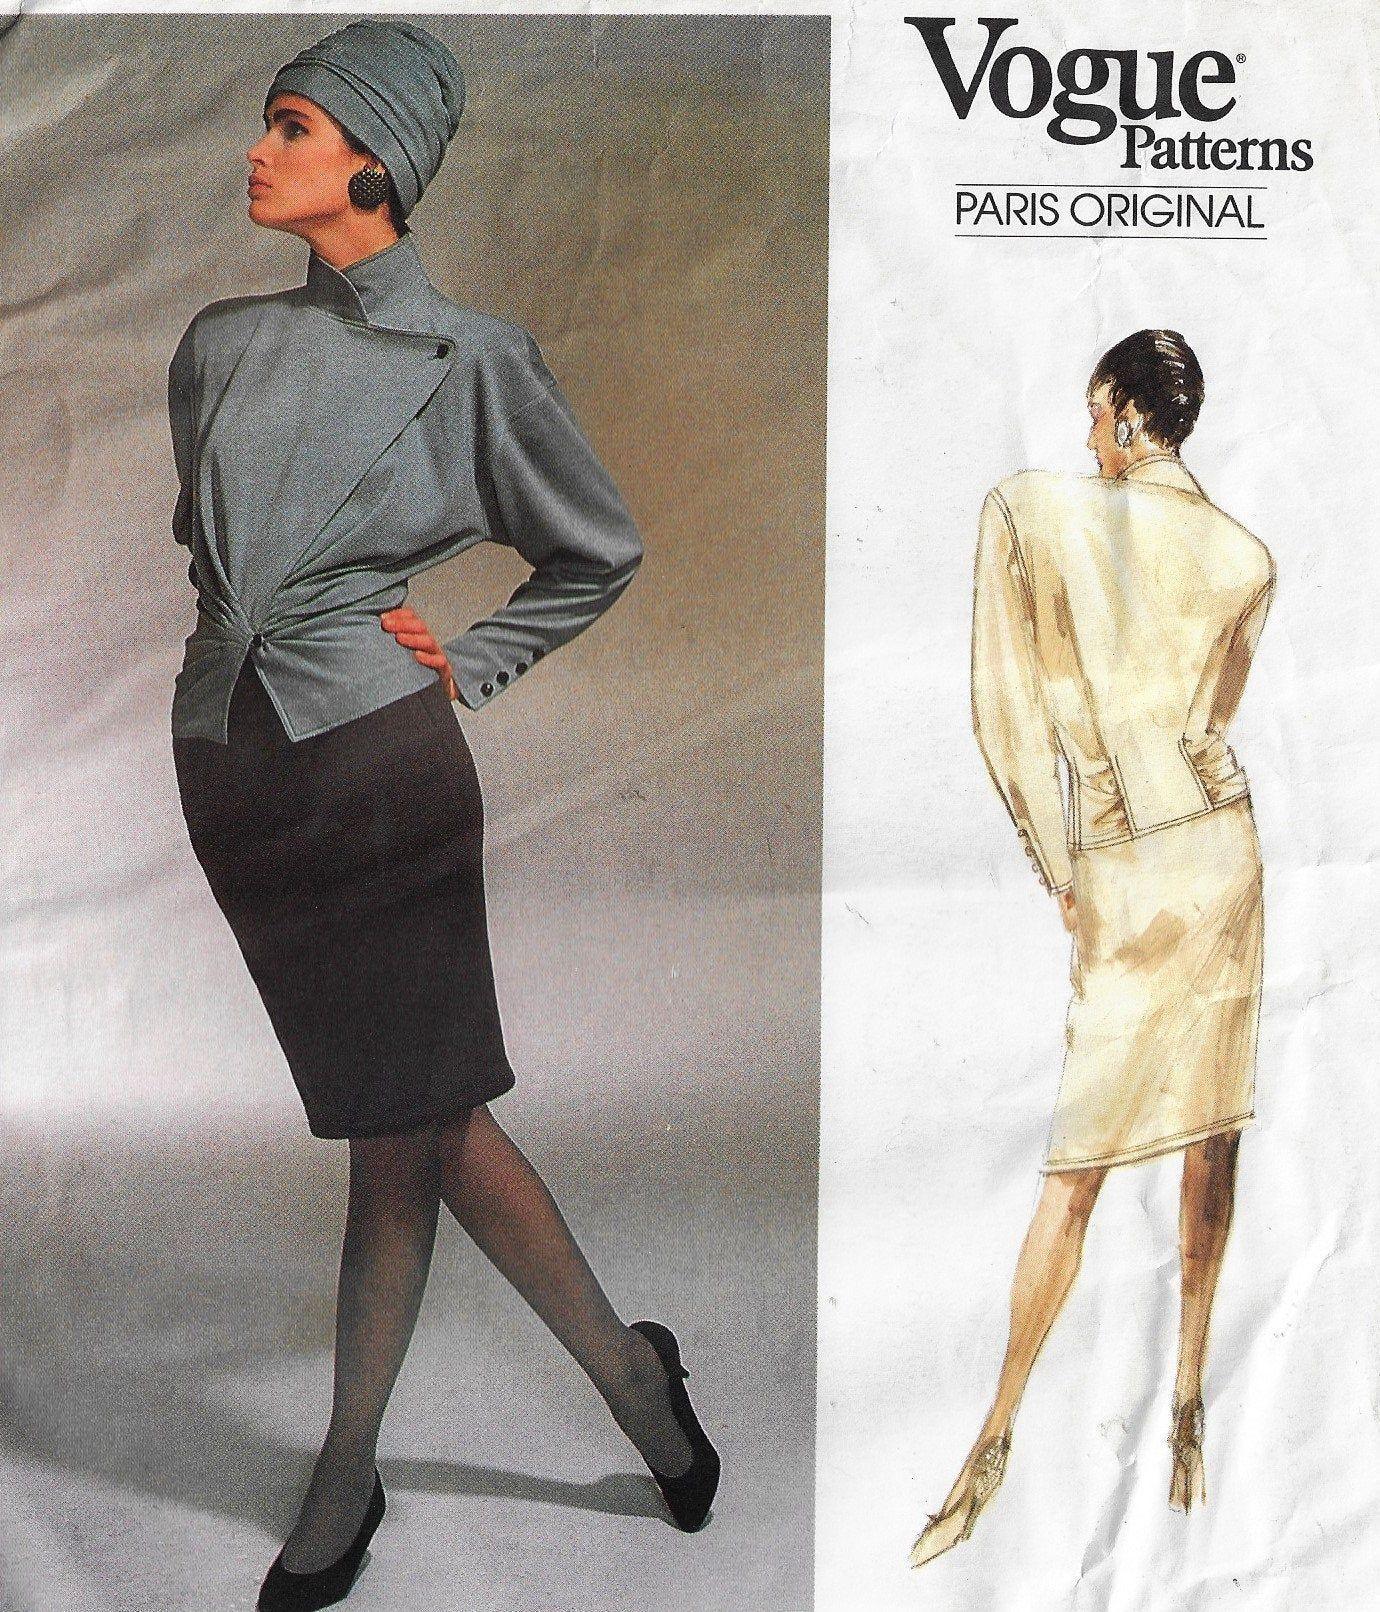 1980s Emanuel Ungaro Womens Asymmetrical Top  Pencil Skirt Vogue Sewing Pattern 1951 Size 14 1980s Emanuel Ungaro Womens Asymmetrical Top  Pencil Skirt Vogue Sewing Patte...